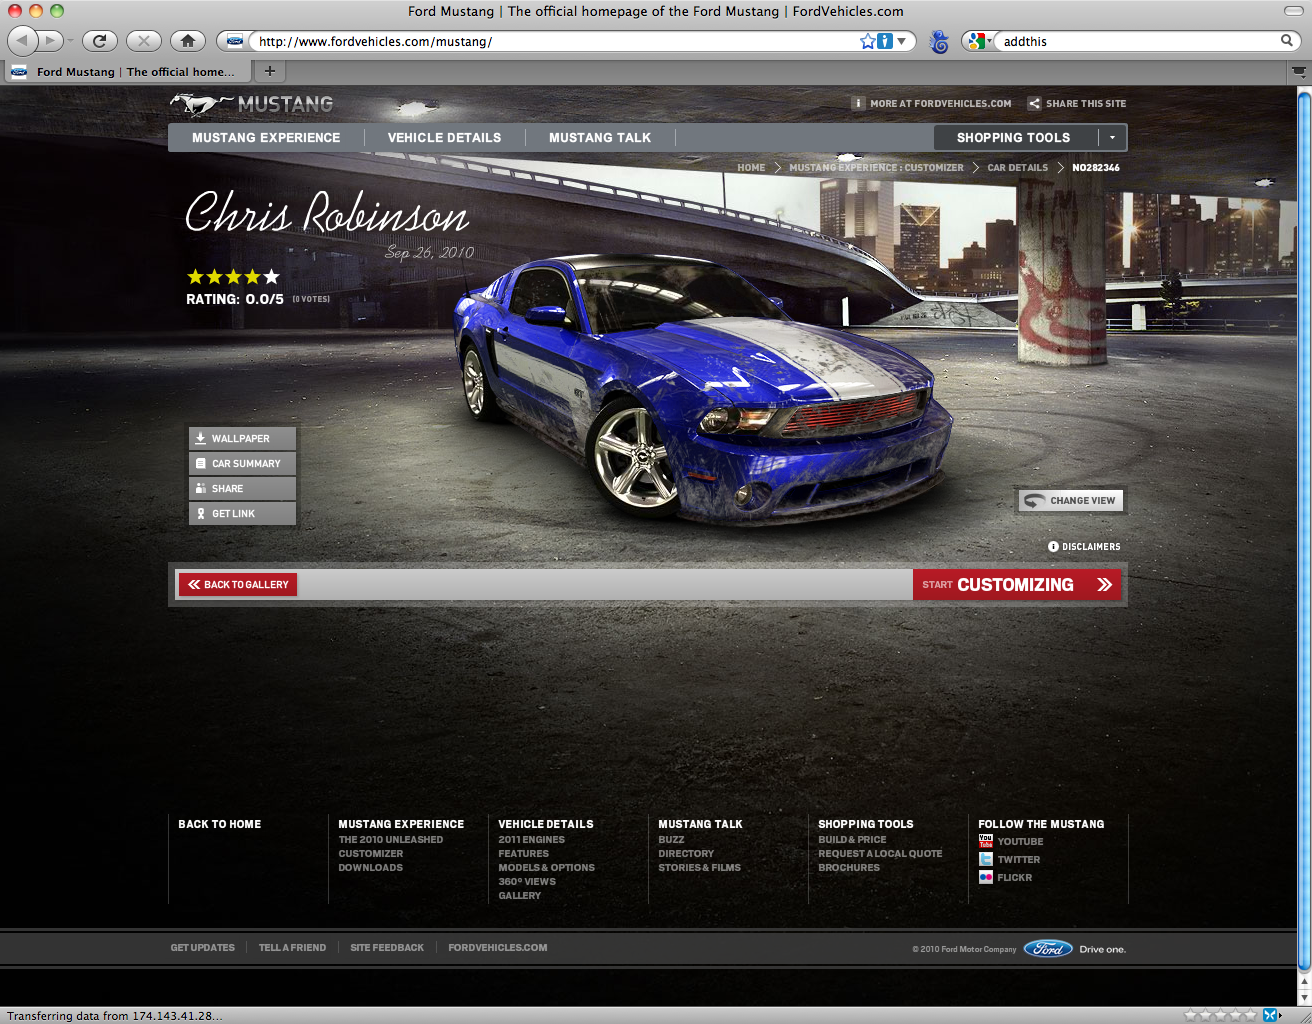 Mustang Customizer - JBR Design